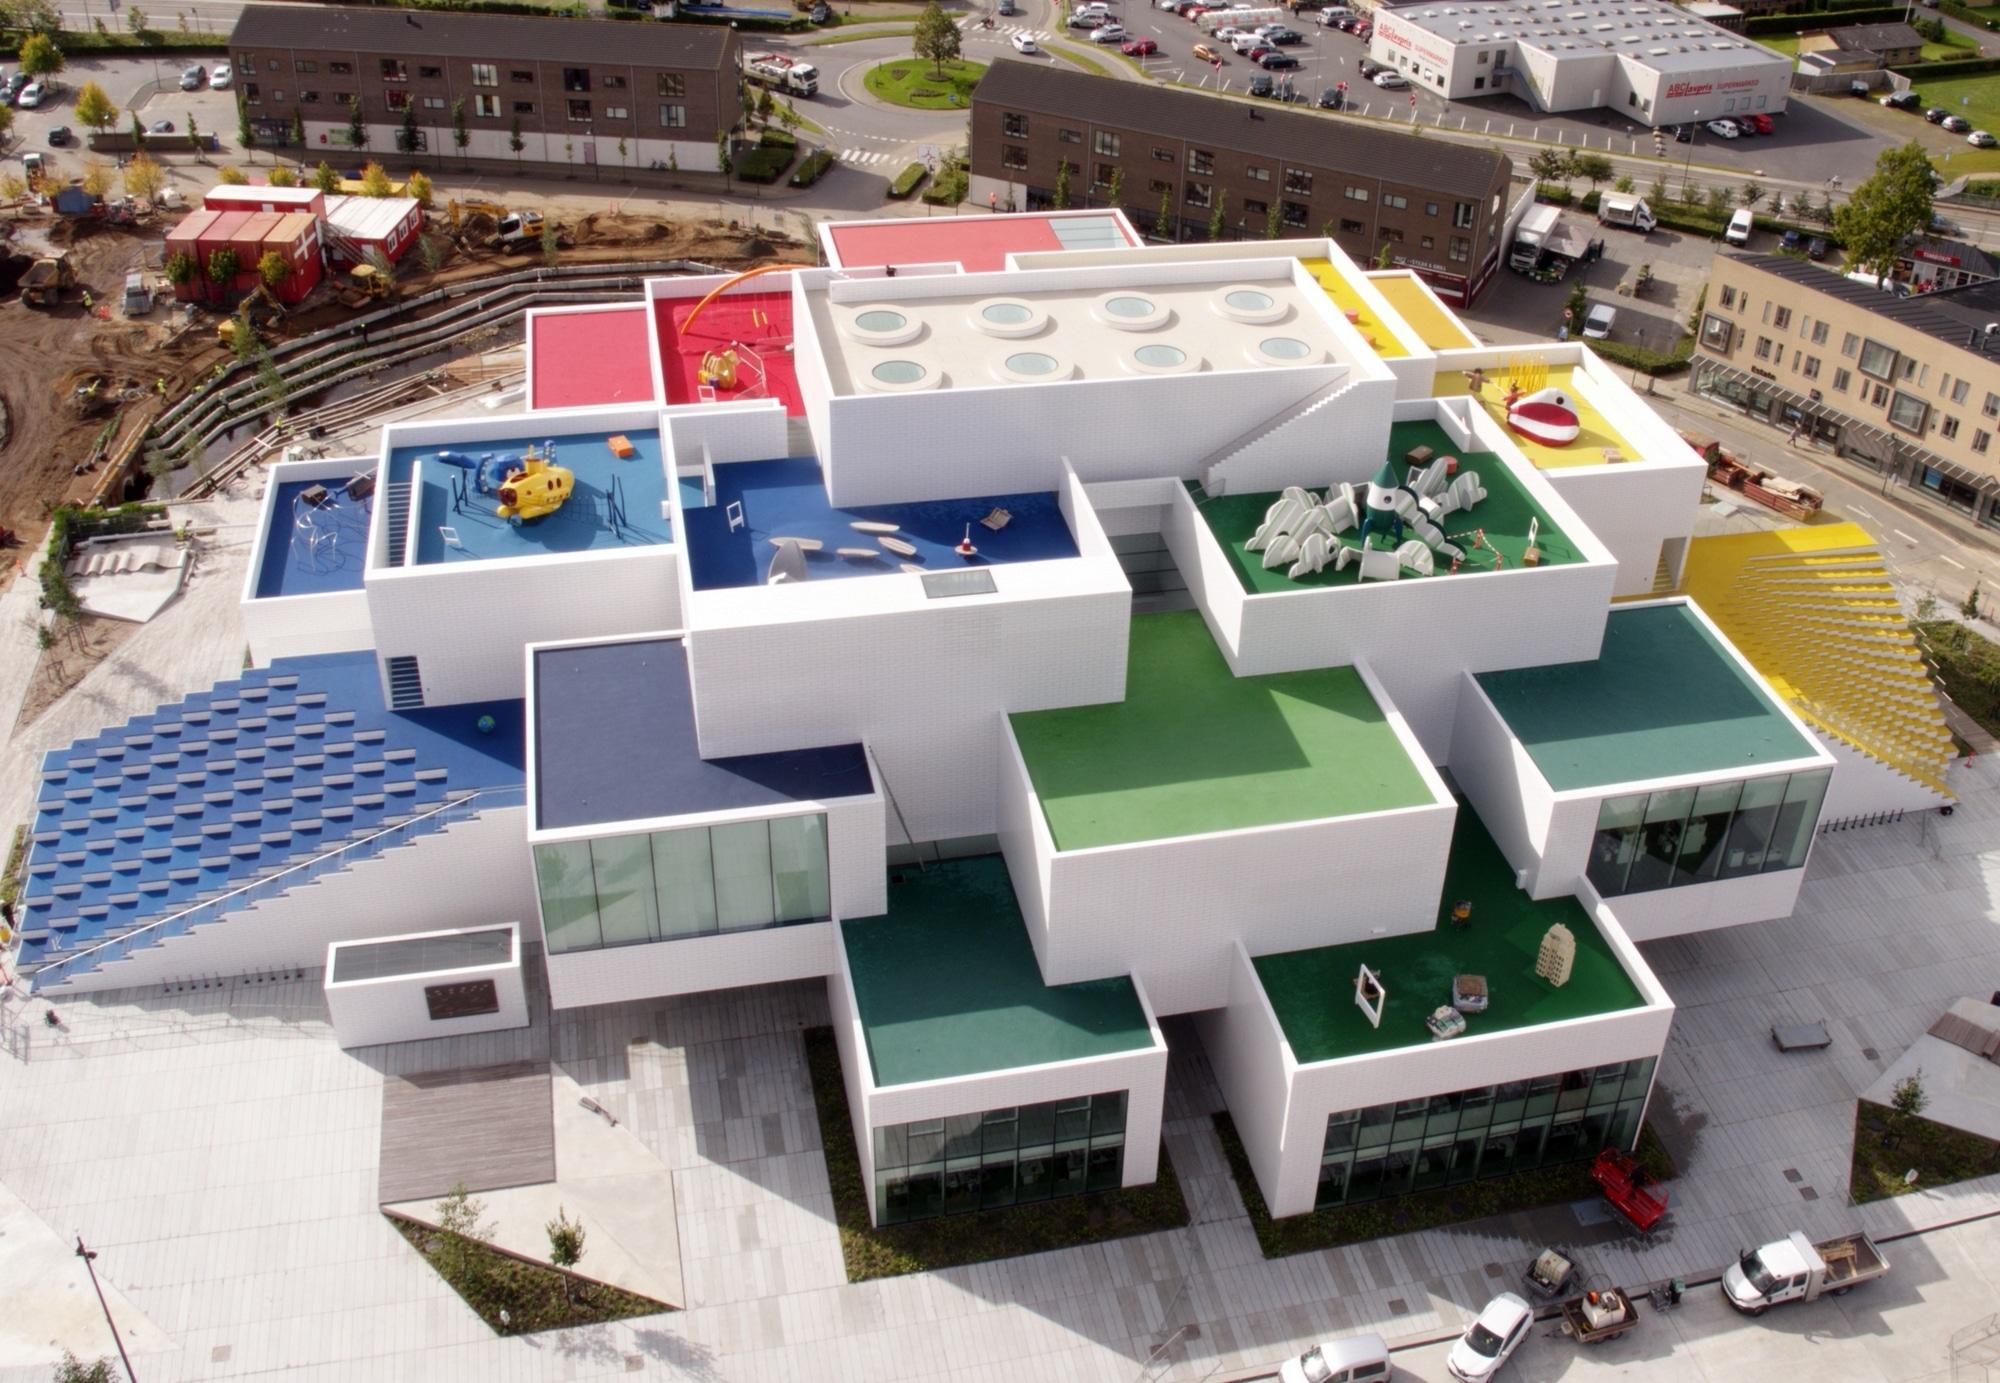 LEGO 21037 LEGO House - Vogelperspektive 2